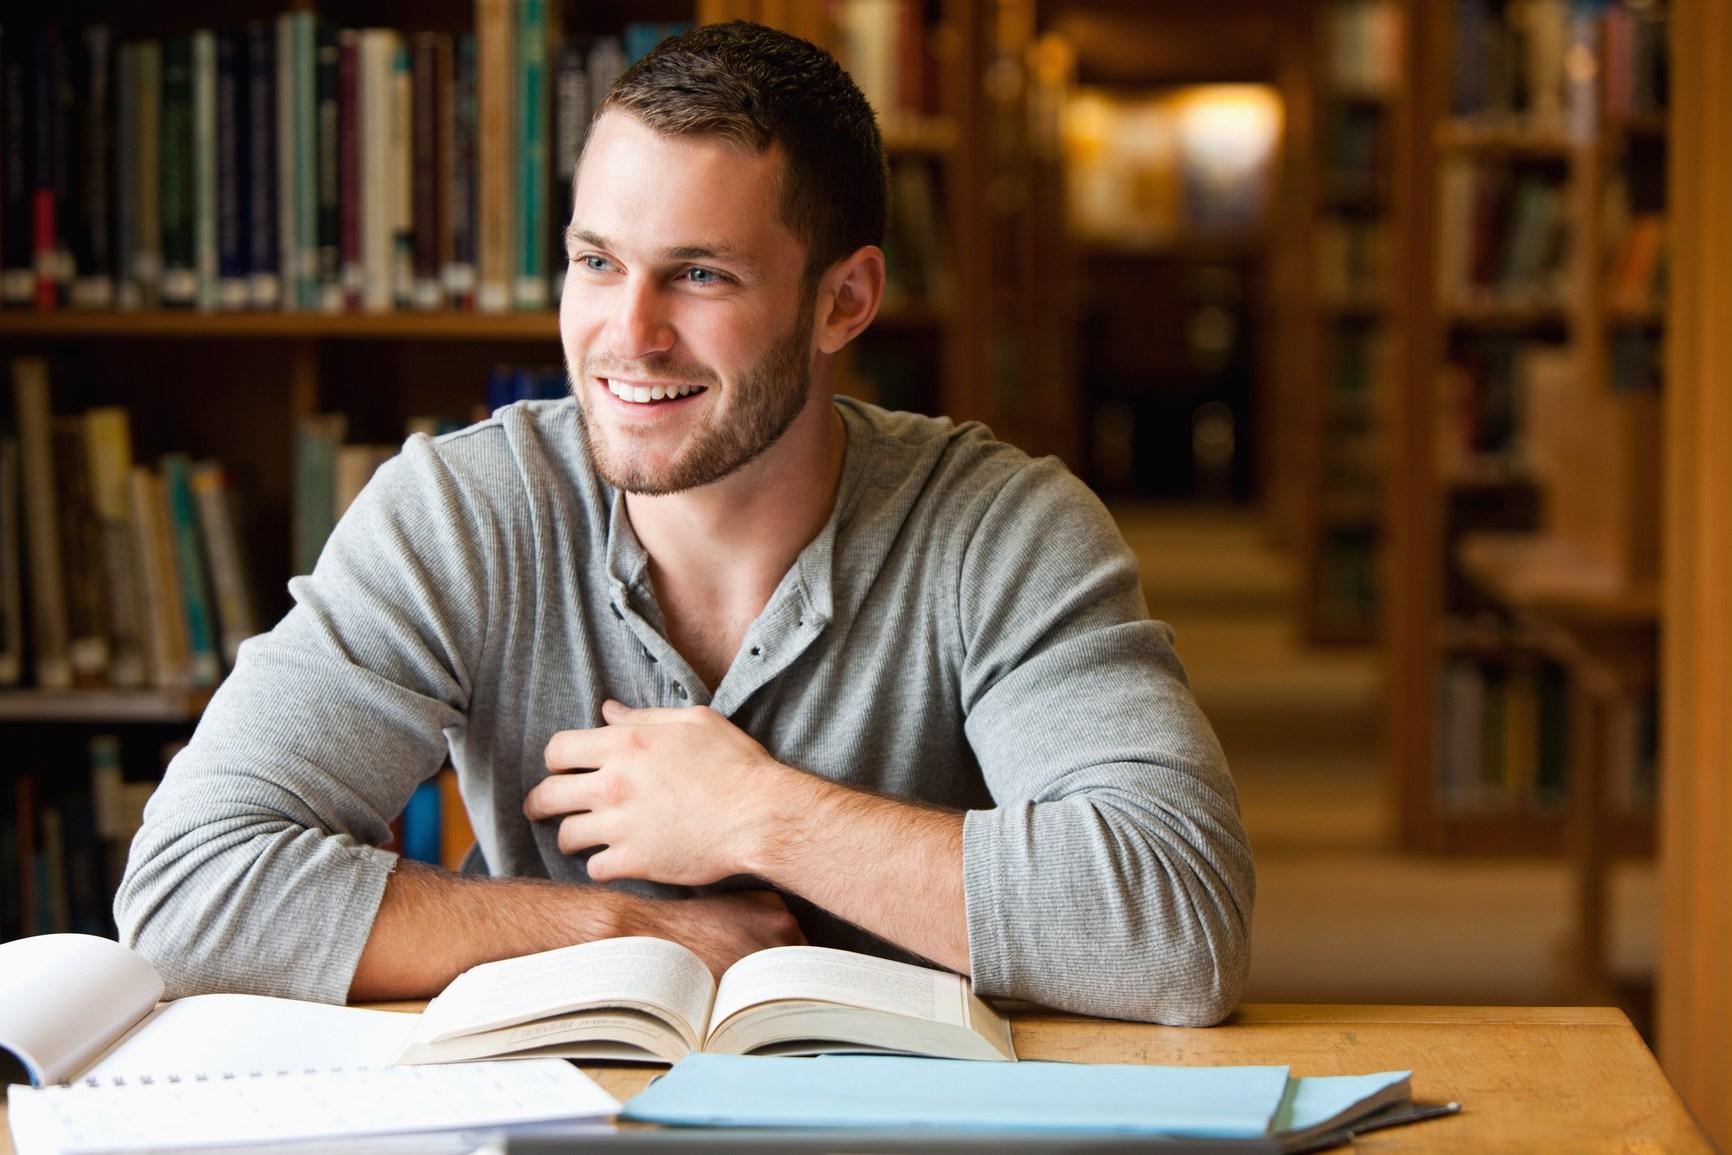 Como obter maior rendimento nos estudos